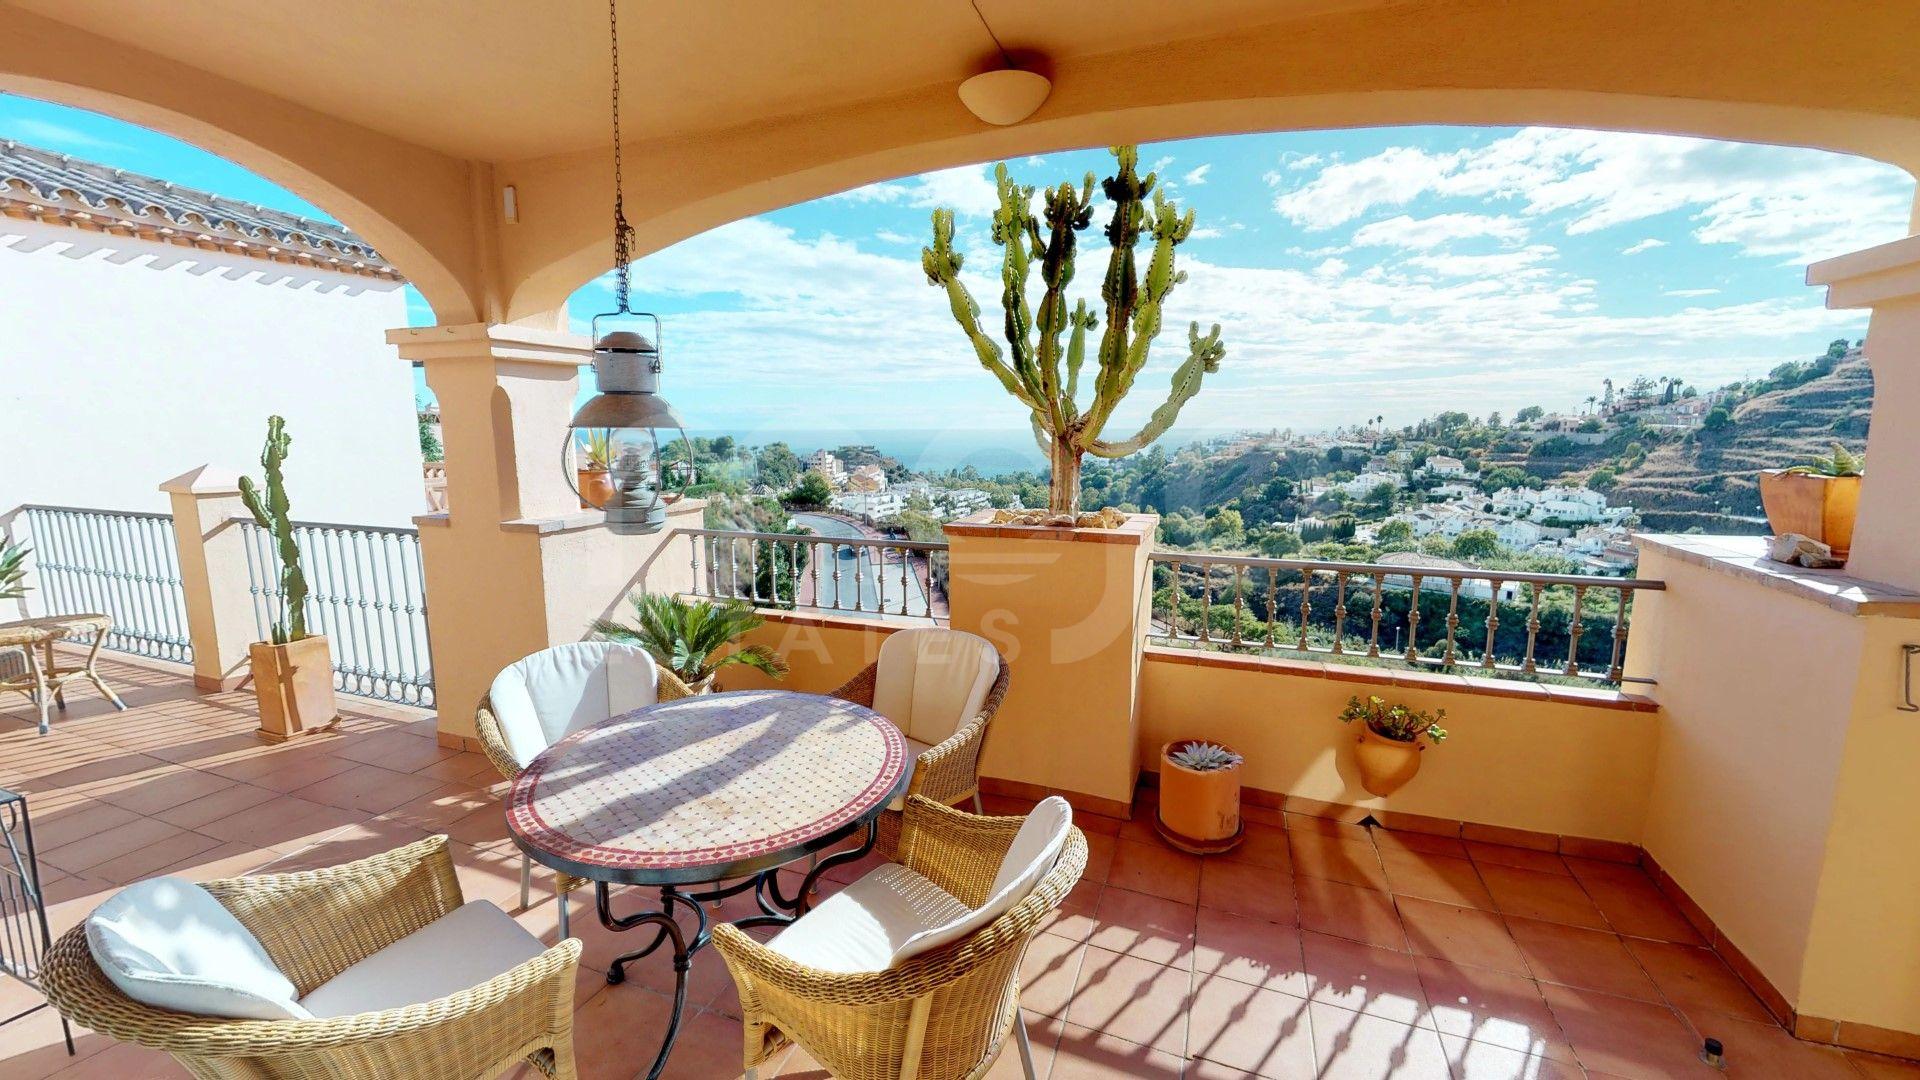 Penthouse for sale in Torrequebrada, Benalmadena